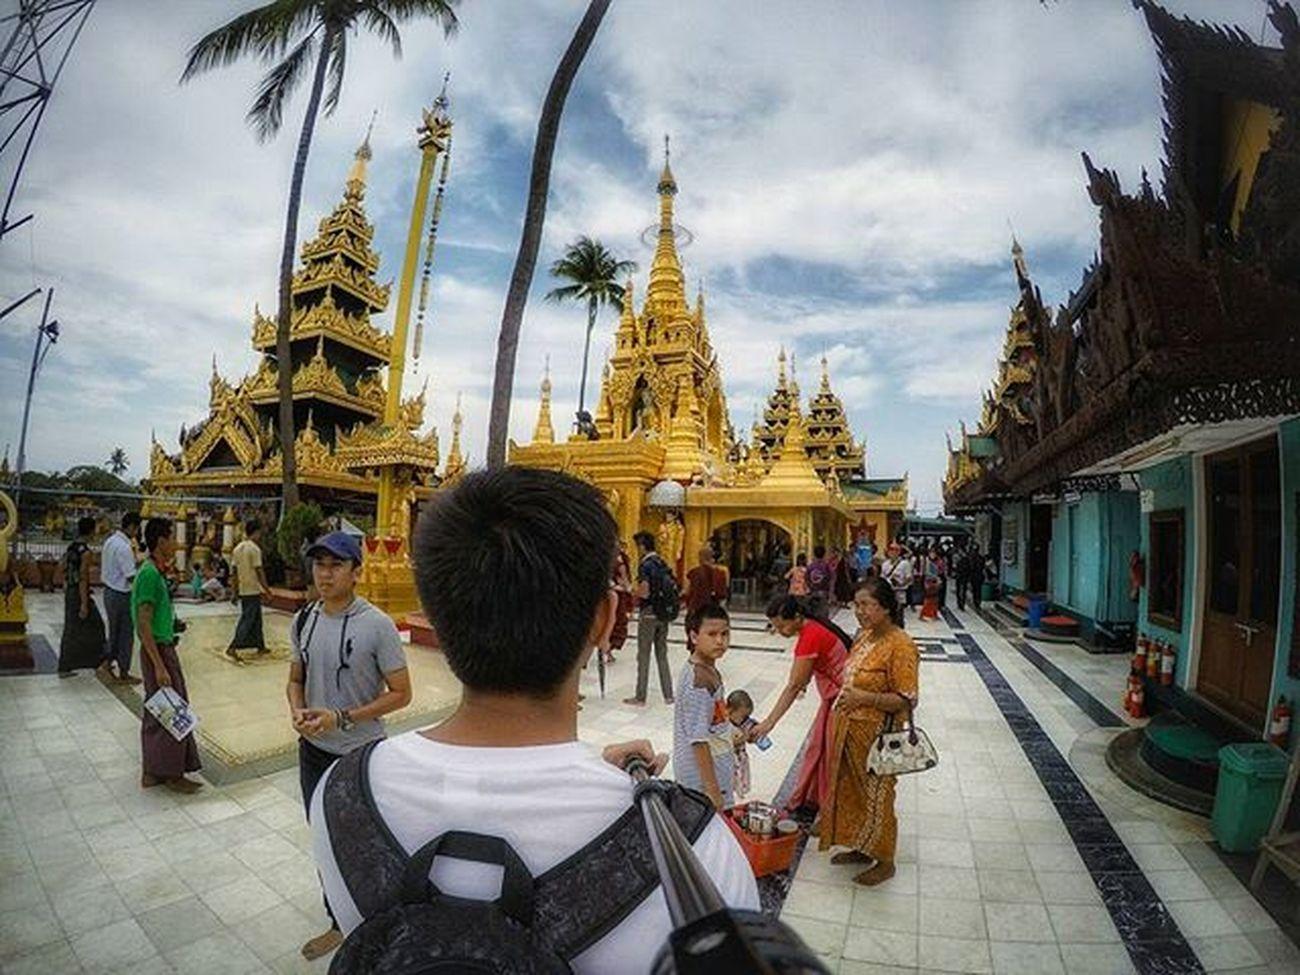 Midstream Kyauktan Pagoda Goprophotography Gopixx Kyauktan Pagoda Igersmyanmar Yangon Myanmar Burma Instagood Yourworldgallery Travelgood Vacationinstyle Choose2create Meistershots Gopro Goprohero4 Lightroom Snapseed